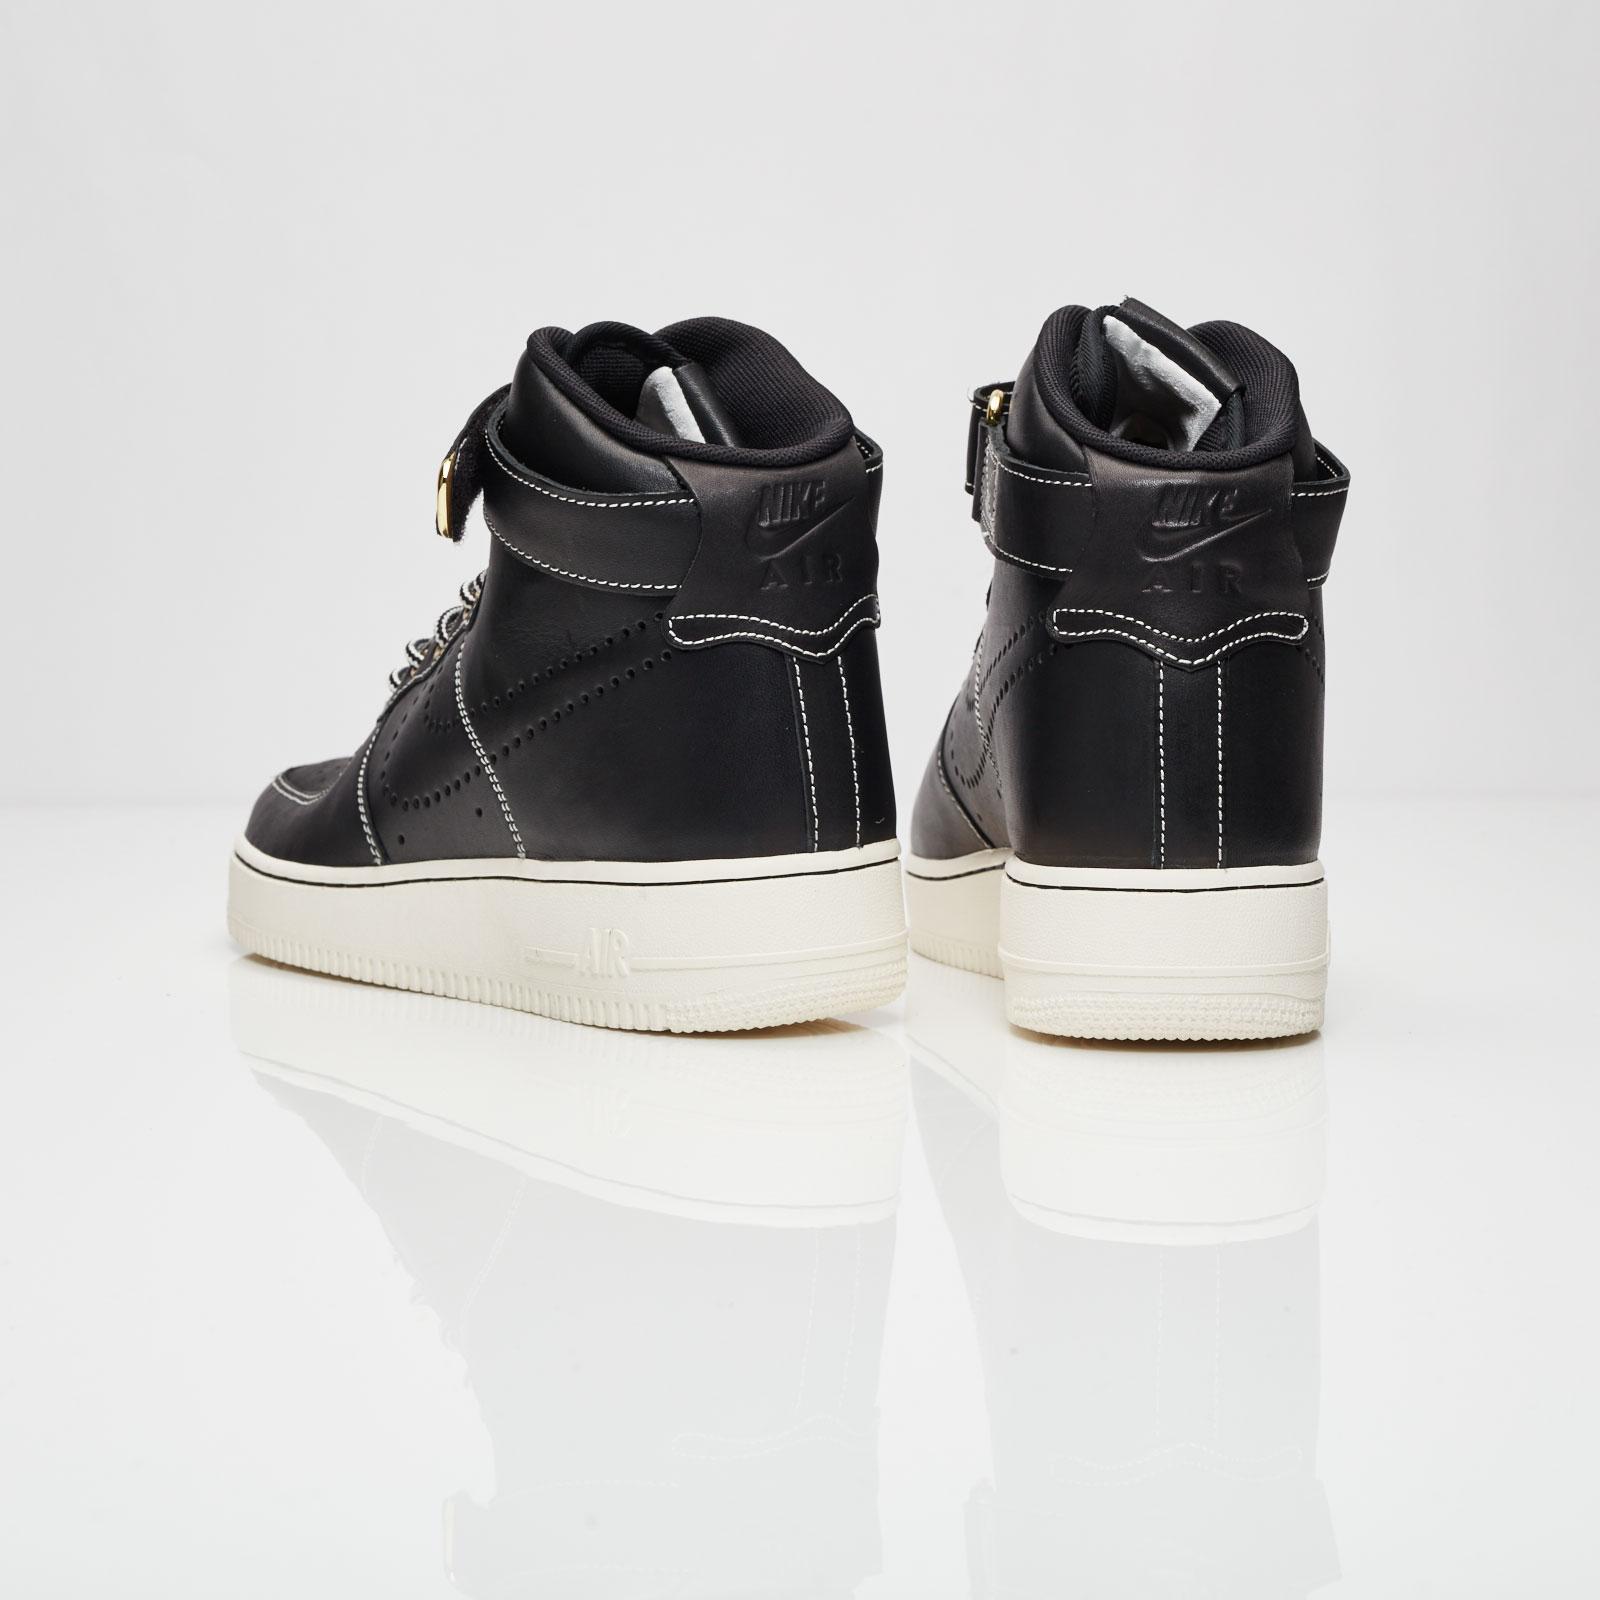 3798c4618c1 Nike Air Force 1 High 07 LV8 WB - 882096-001 - Sneakersnstuff ...